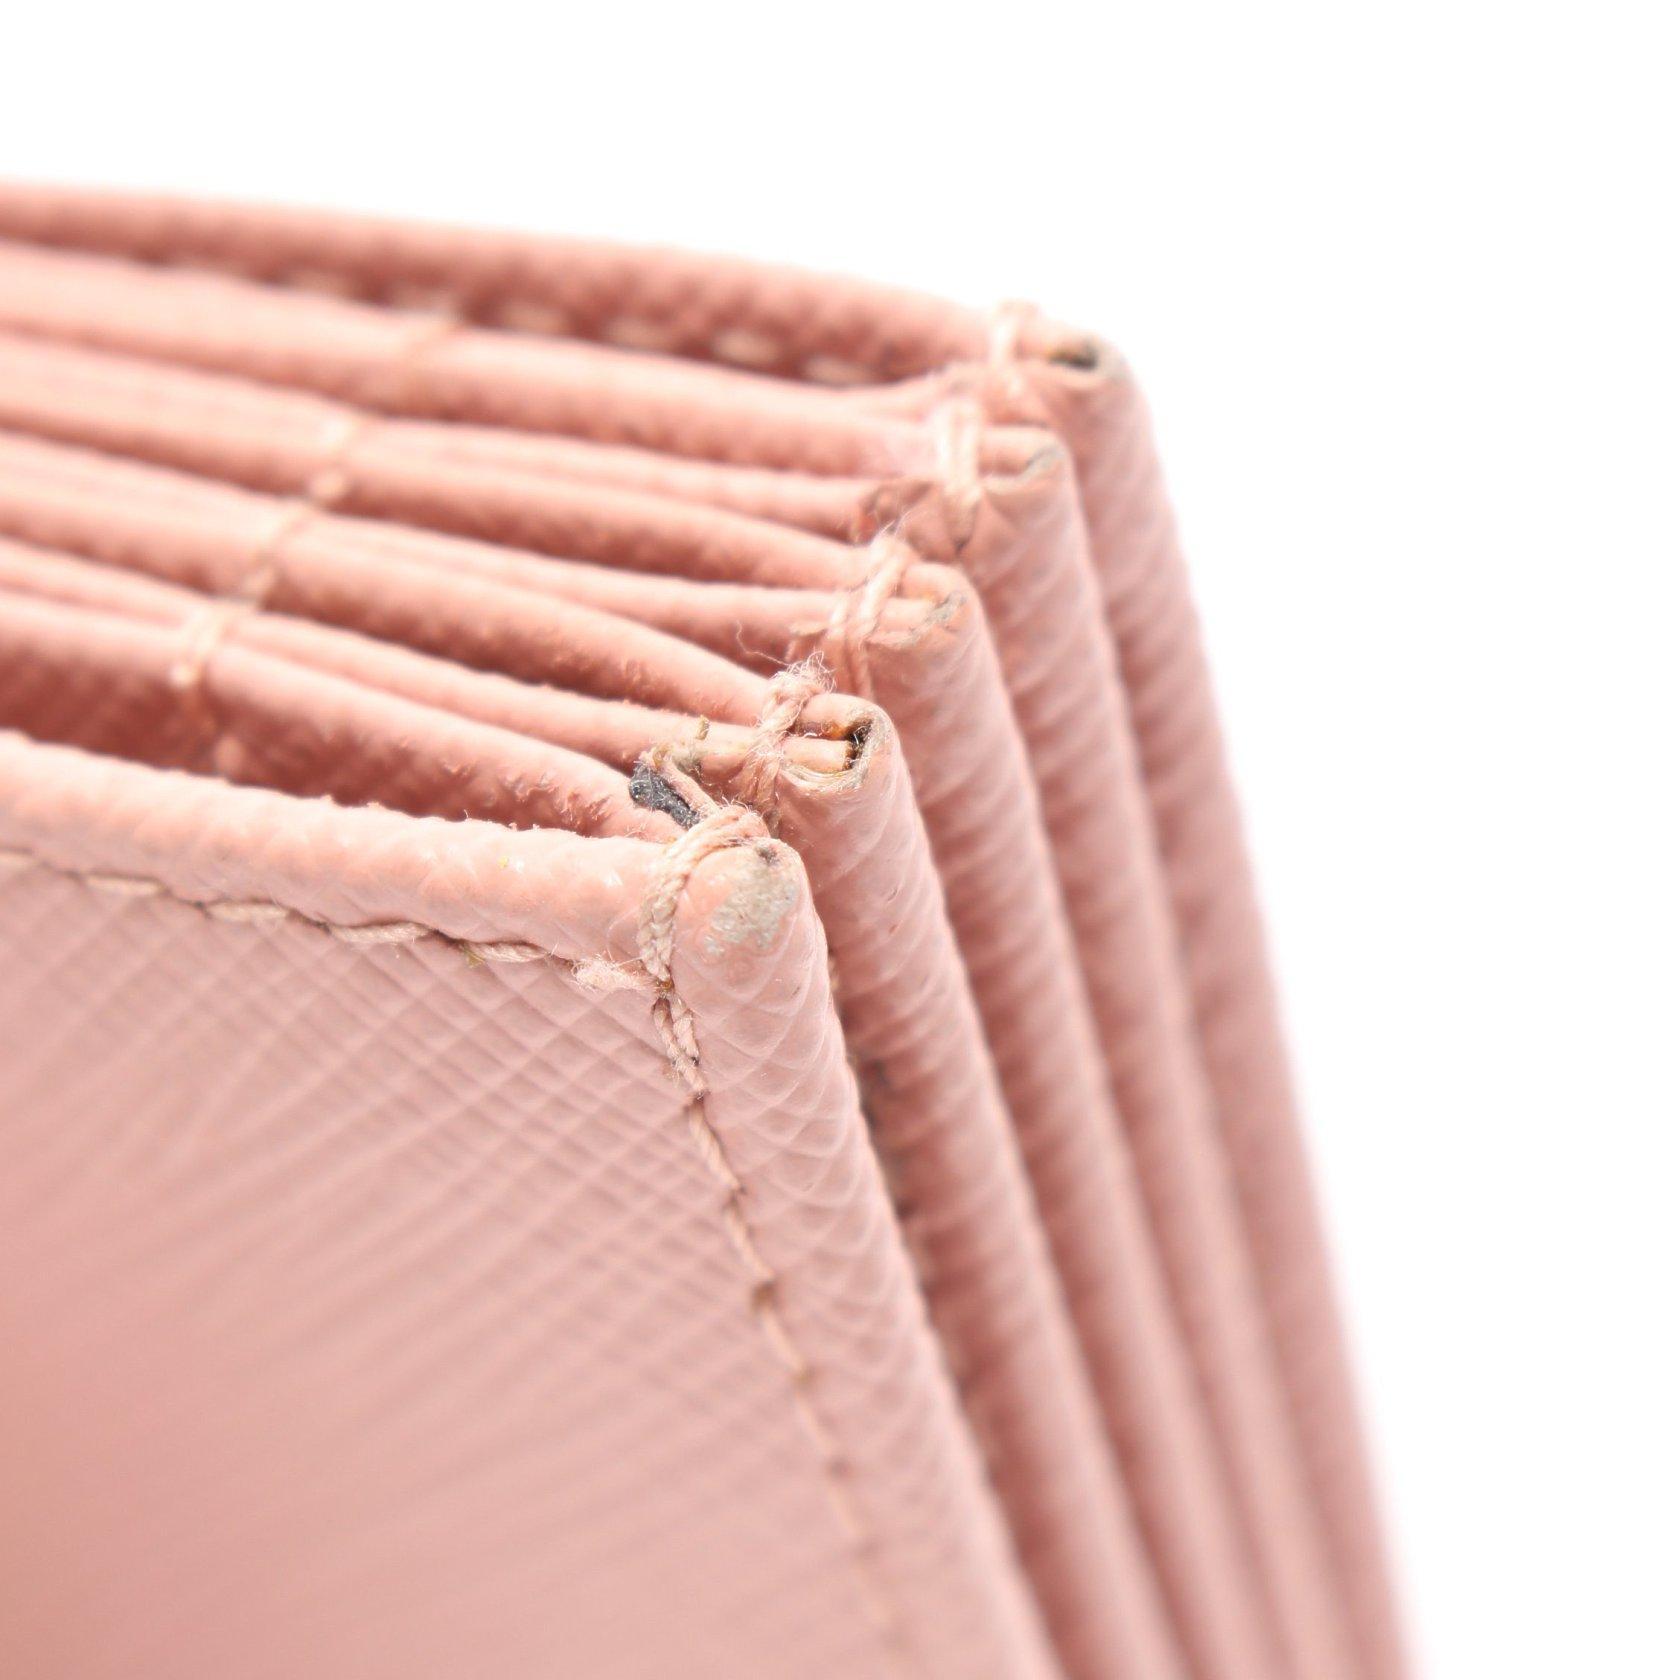 PRADA・財布・小物・SAFFIANO METAL カードケース サフィアーノレザー ピンク